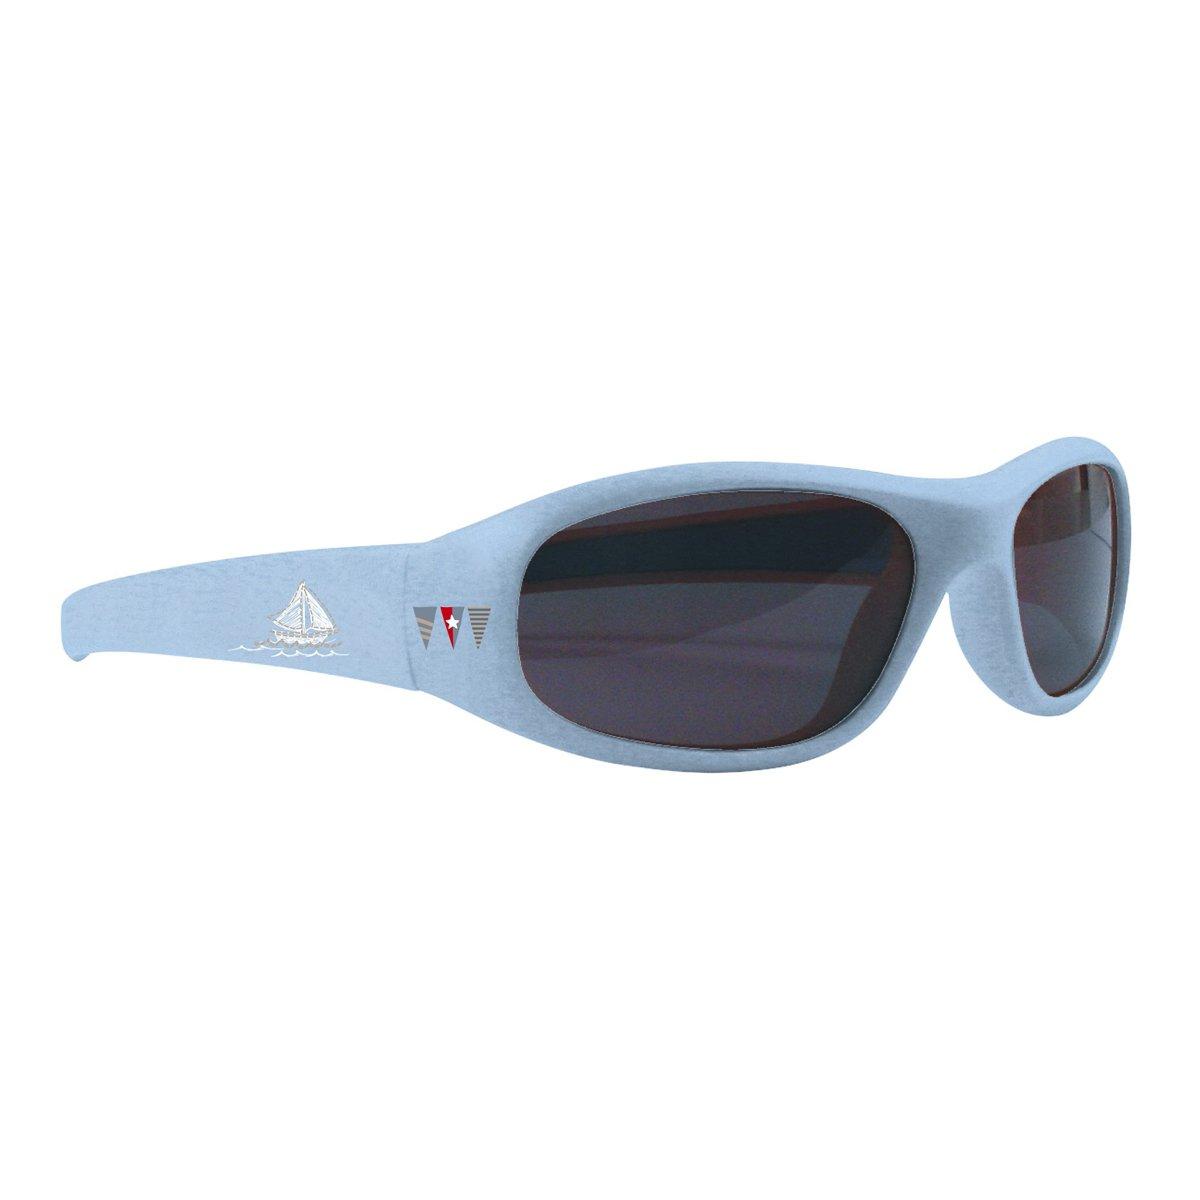 Amazon.com: Chicco sunglasses Sunglasses Mystery Collection ...